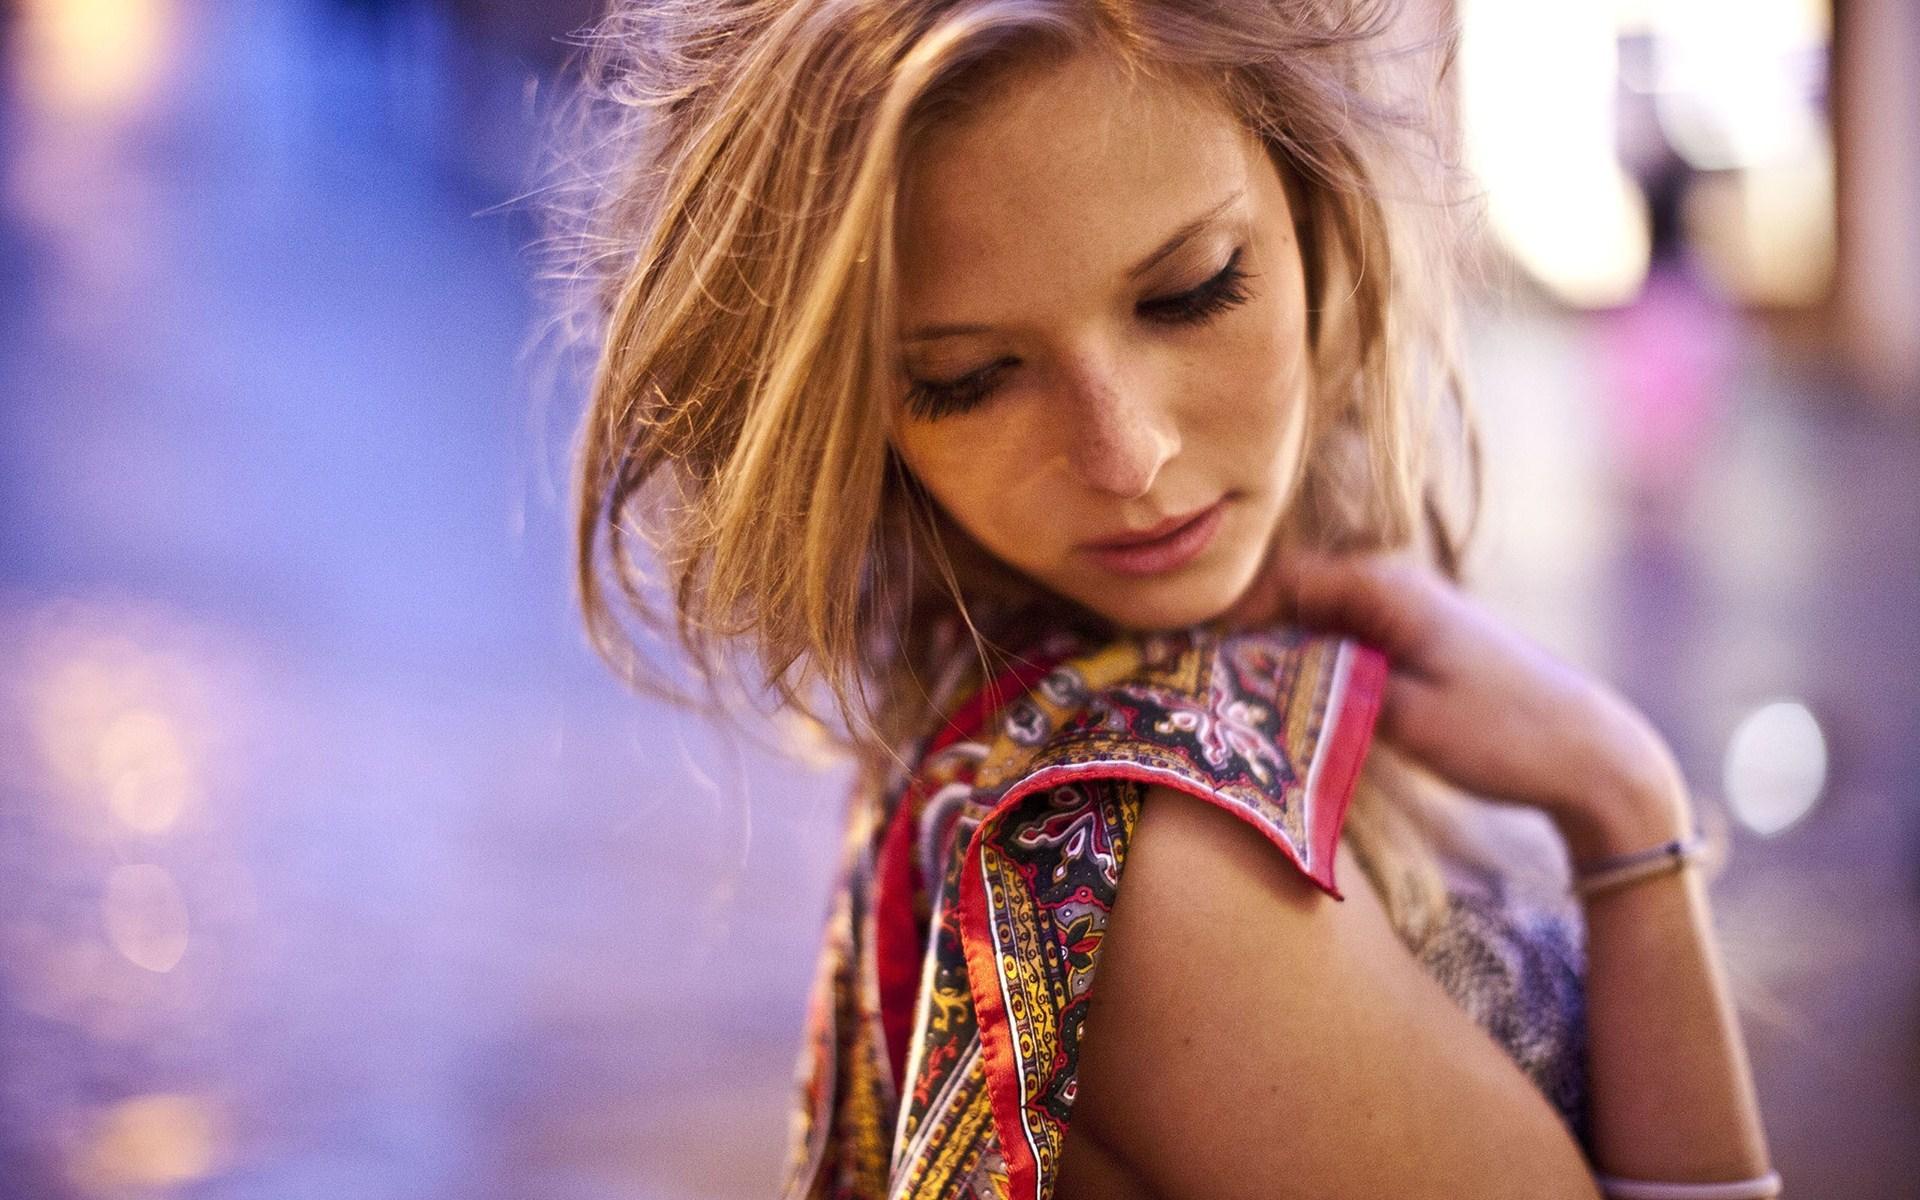 Beautiful Blonde Girl Macro